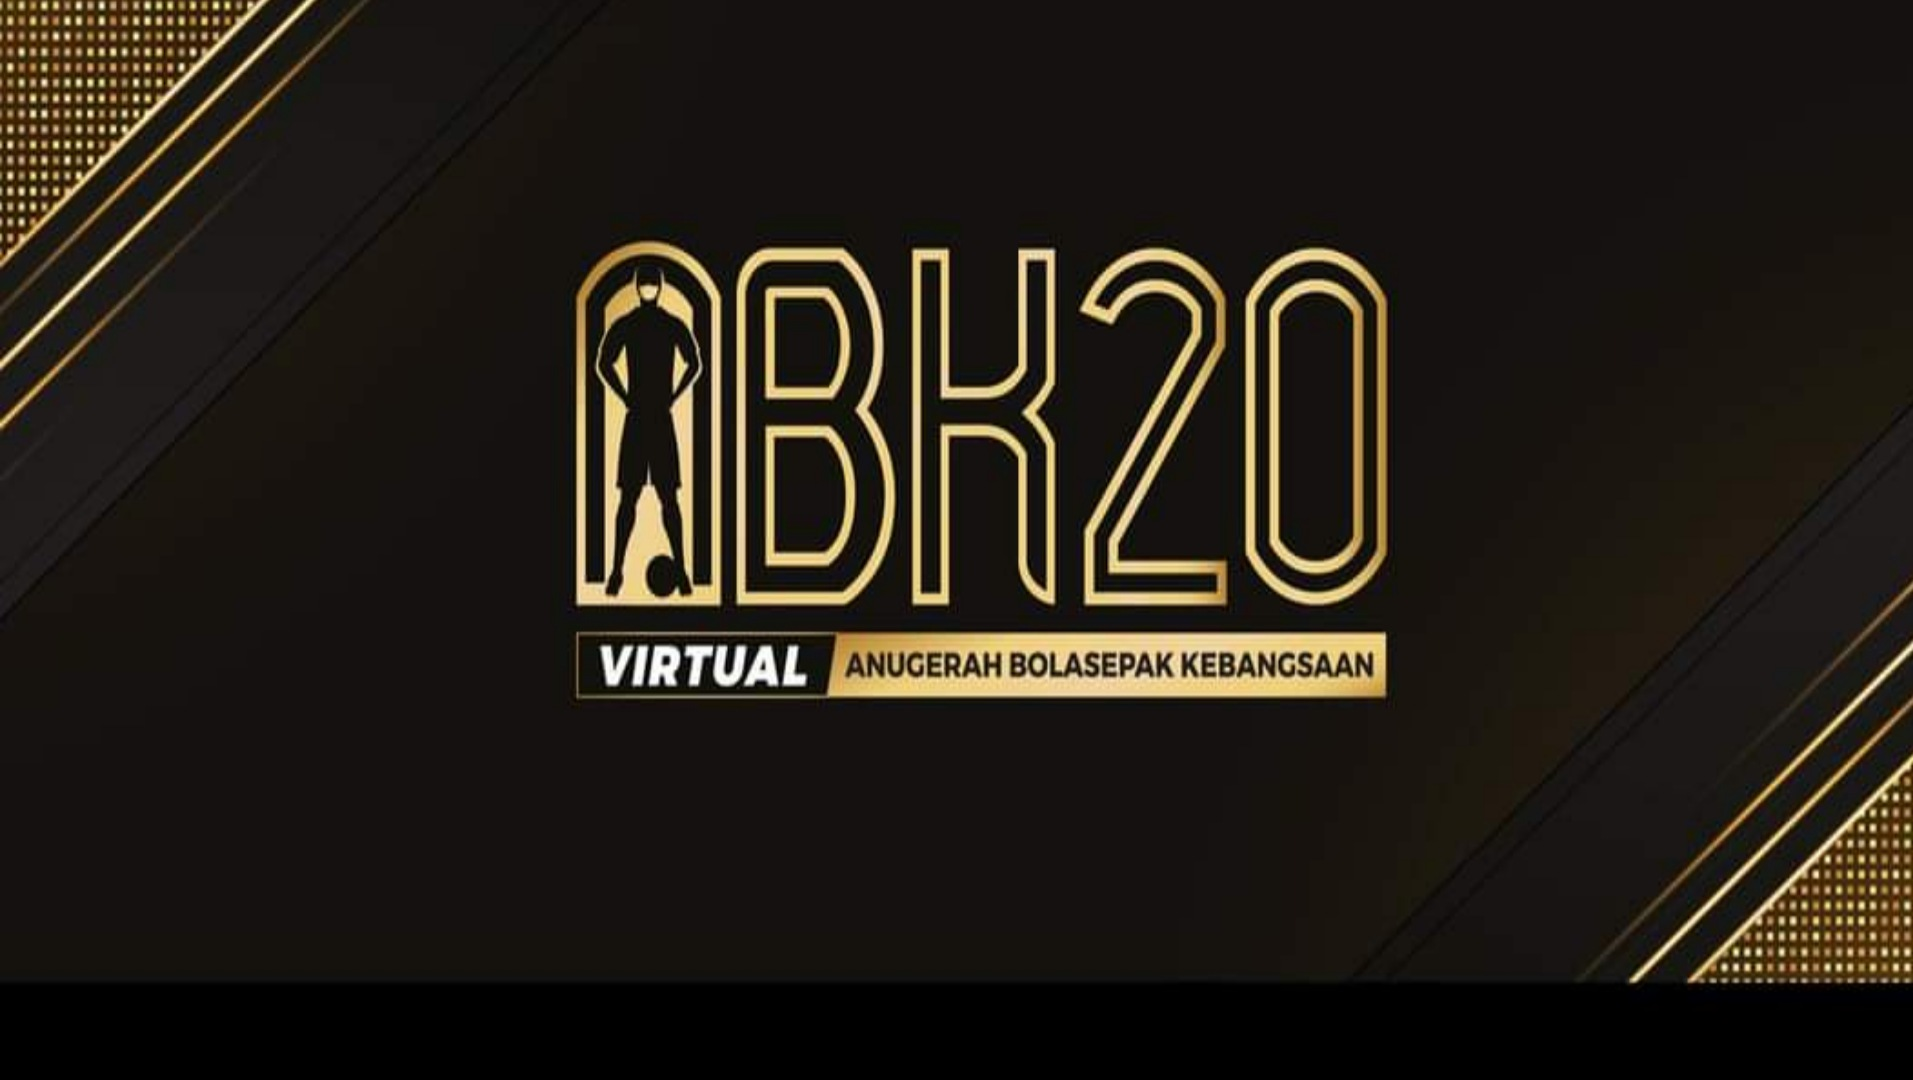 Keputusan Pemenang ABK 2020 (Anugerah Bolasepak Kebangsaan)